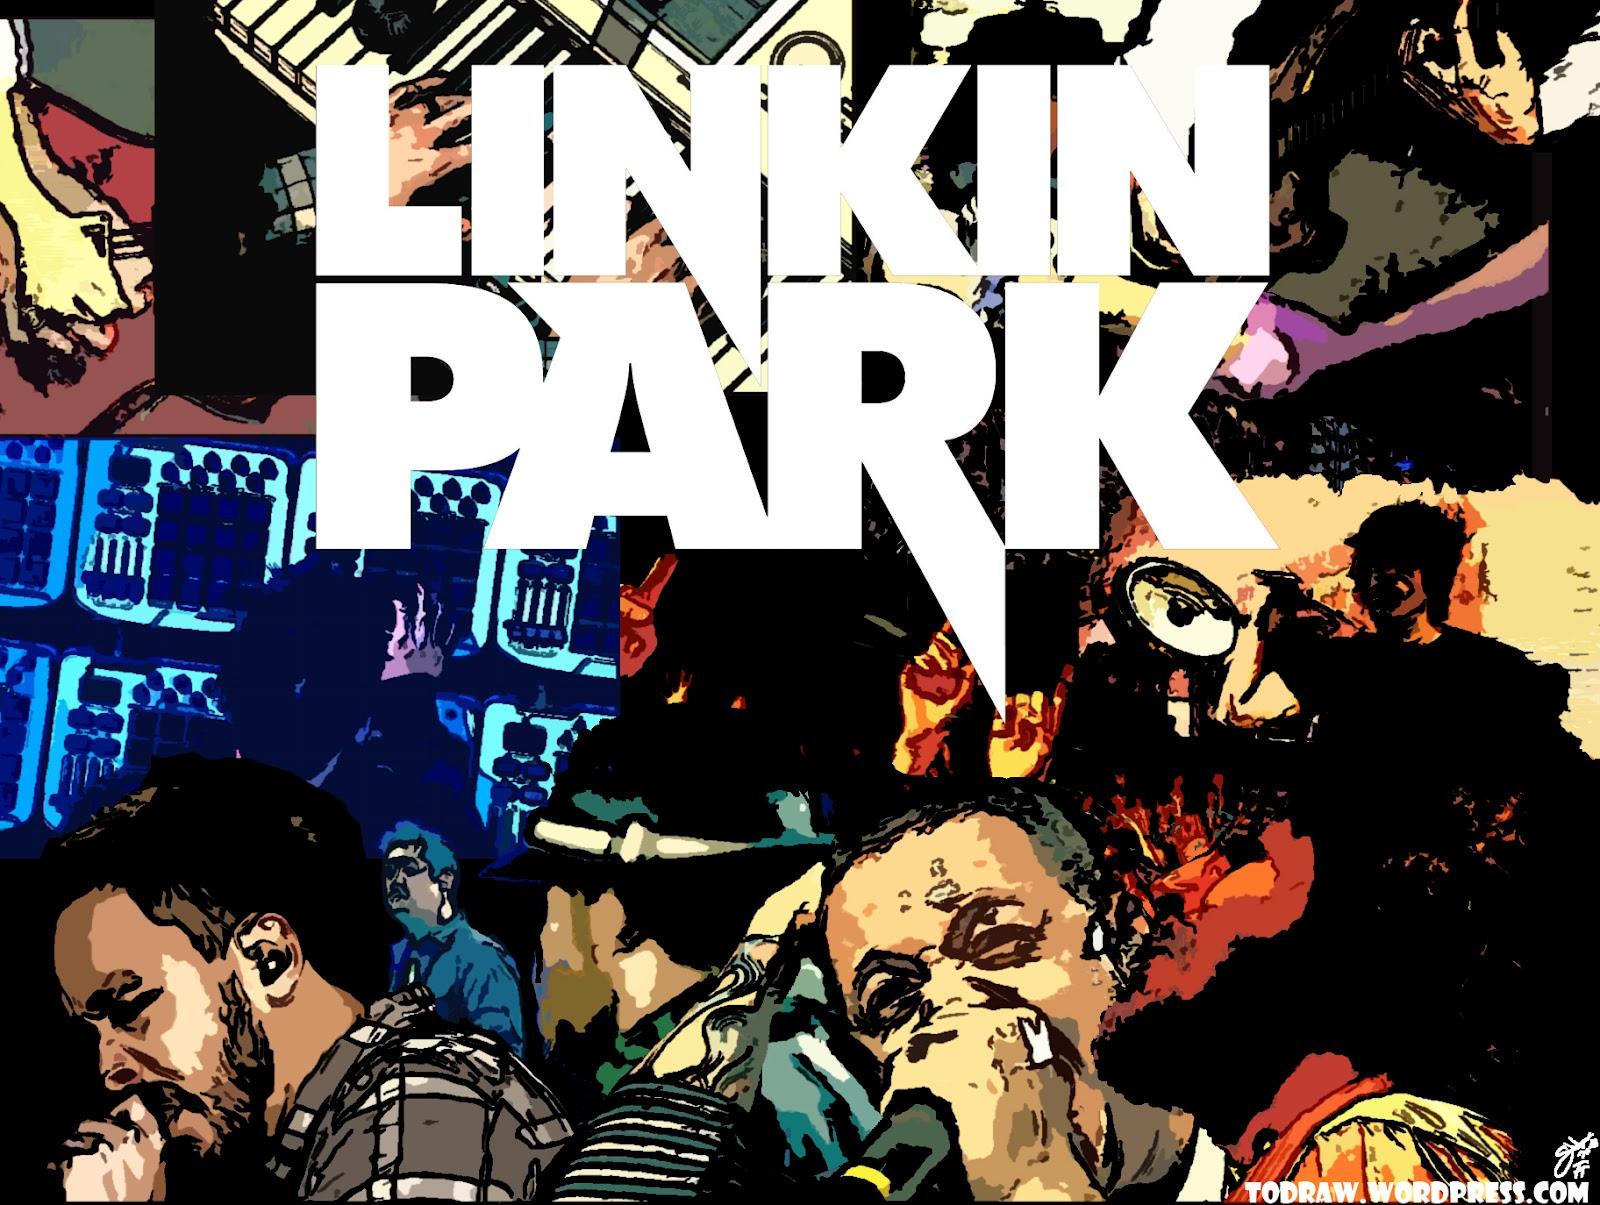 The Simpsons Iphone Wallpaper Wallpapers Hd Linkin Park Banda De Rock Wallpapers De La